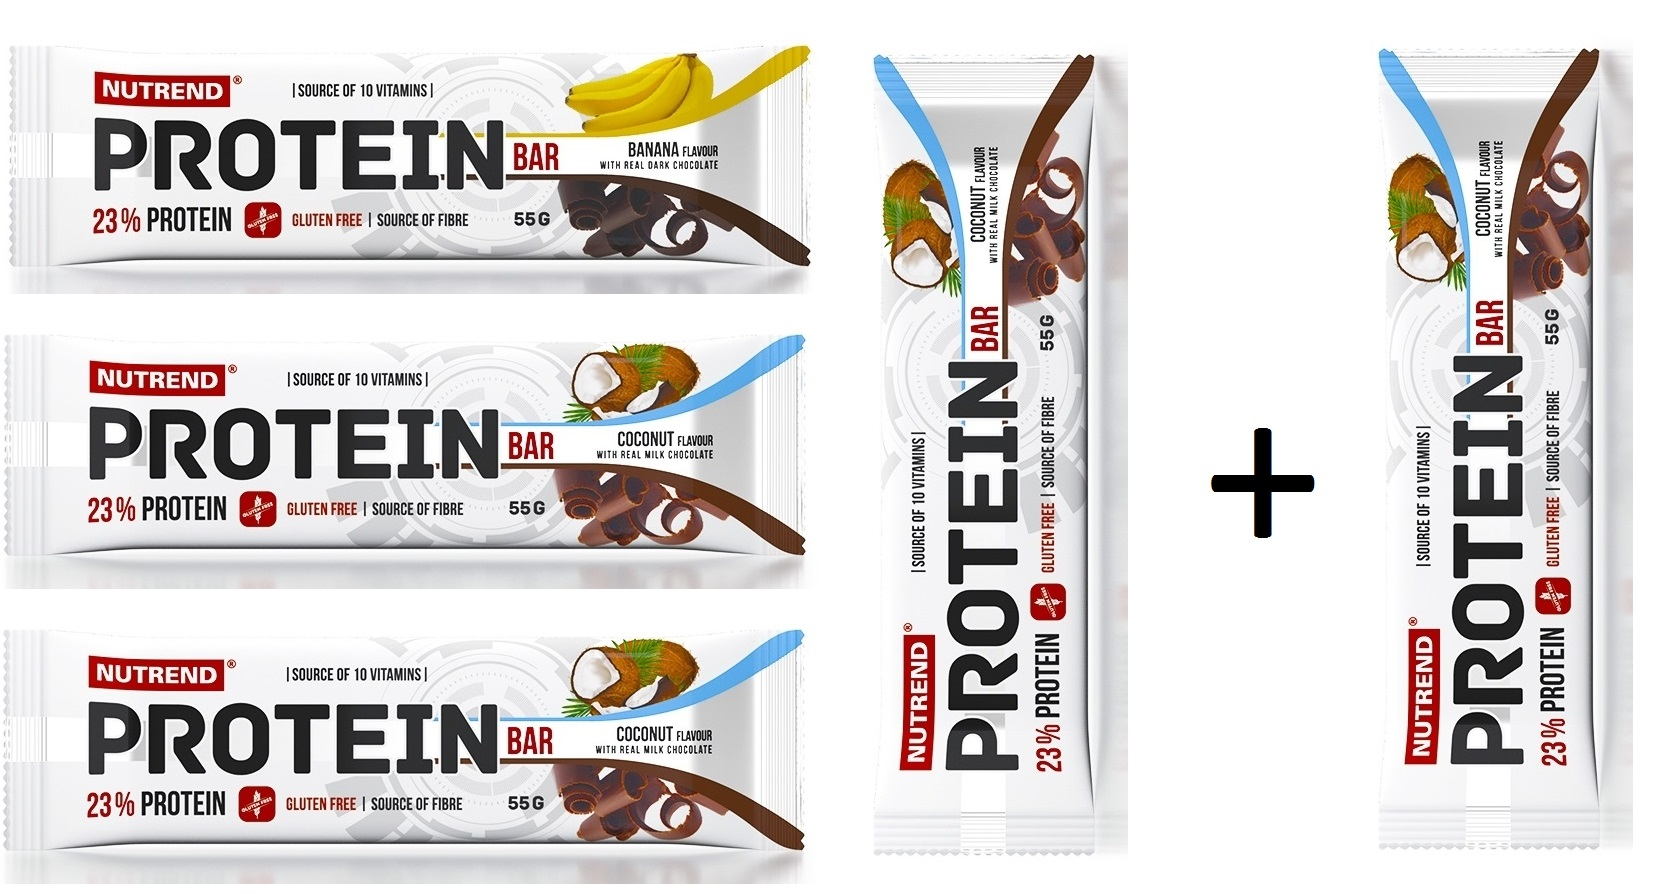 Výsledek obrázku pro proteinová tyčinka nutrend protein bar